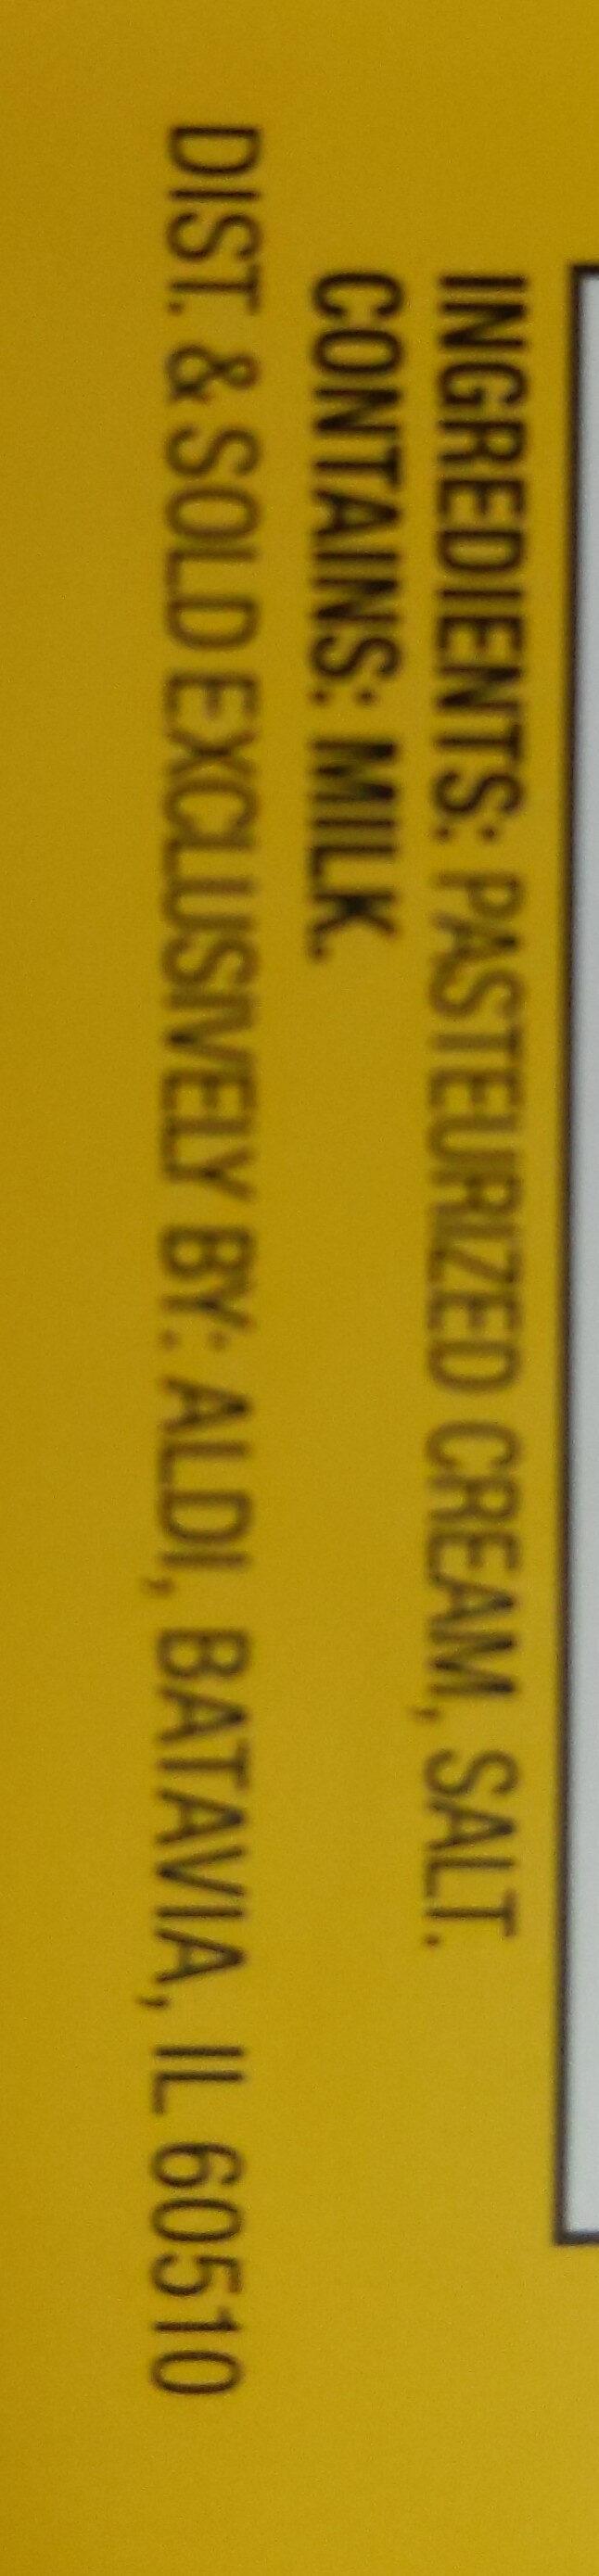 Salted Butter - Ingredients - en